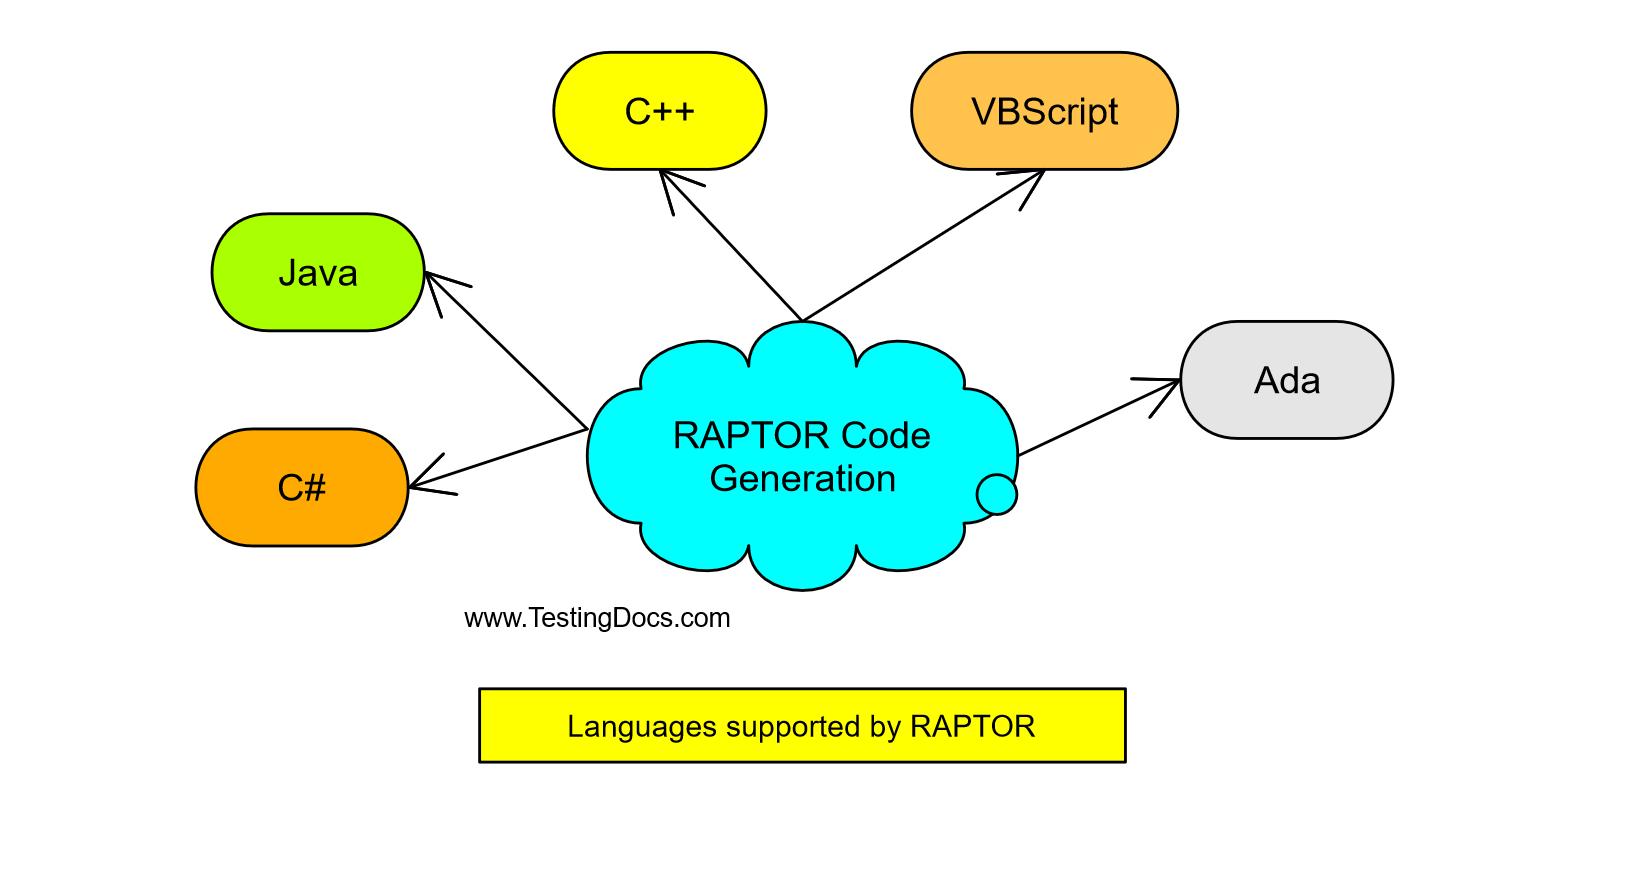 Raptor Code Generation